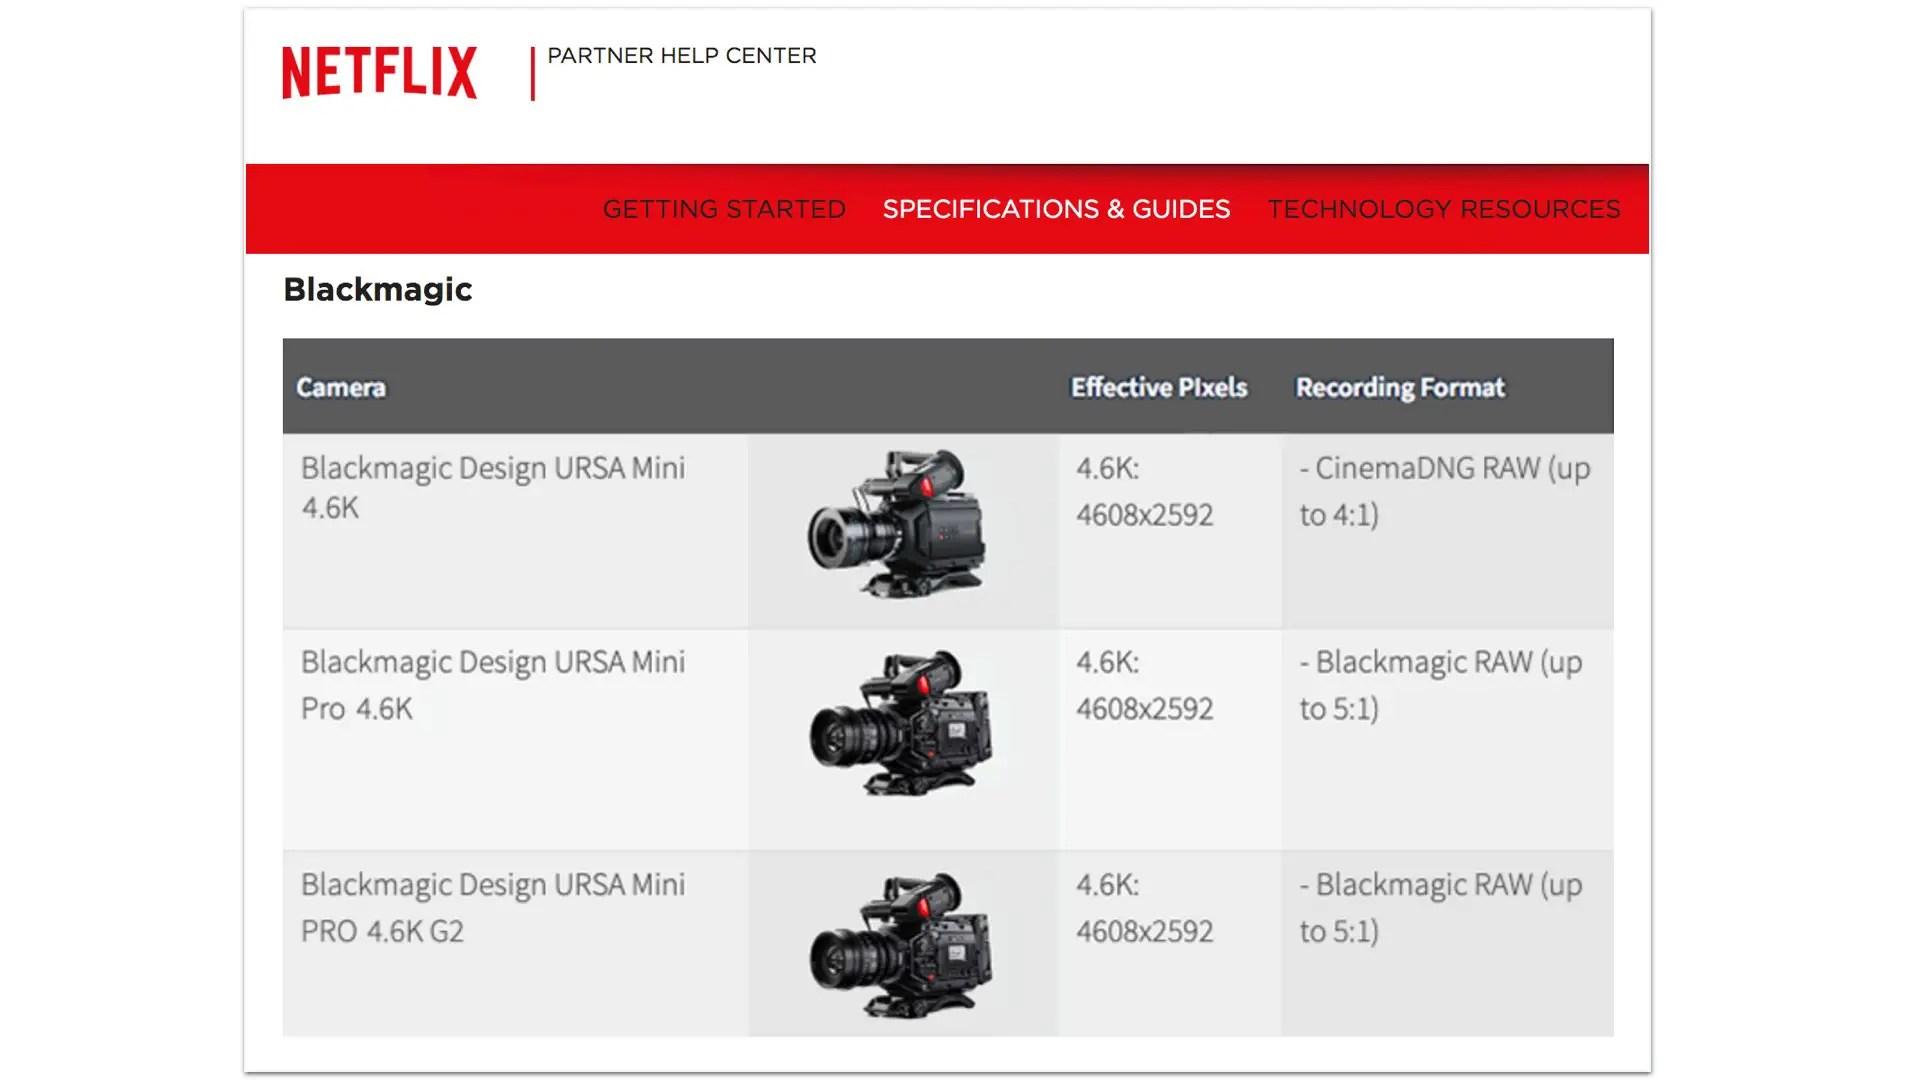 Blackmagic Design Announces Camera 6 9 3 Update For The Ursa Mini Pro 4 6k Y M Cinema News Insights On Digital Cinema